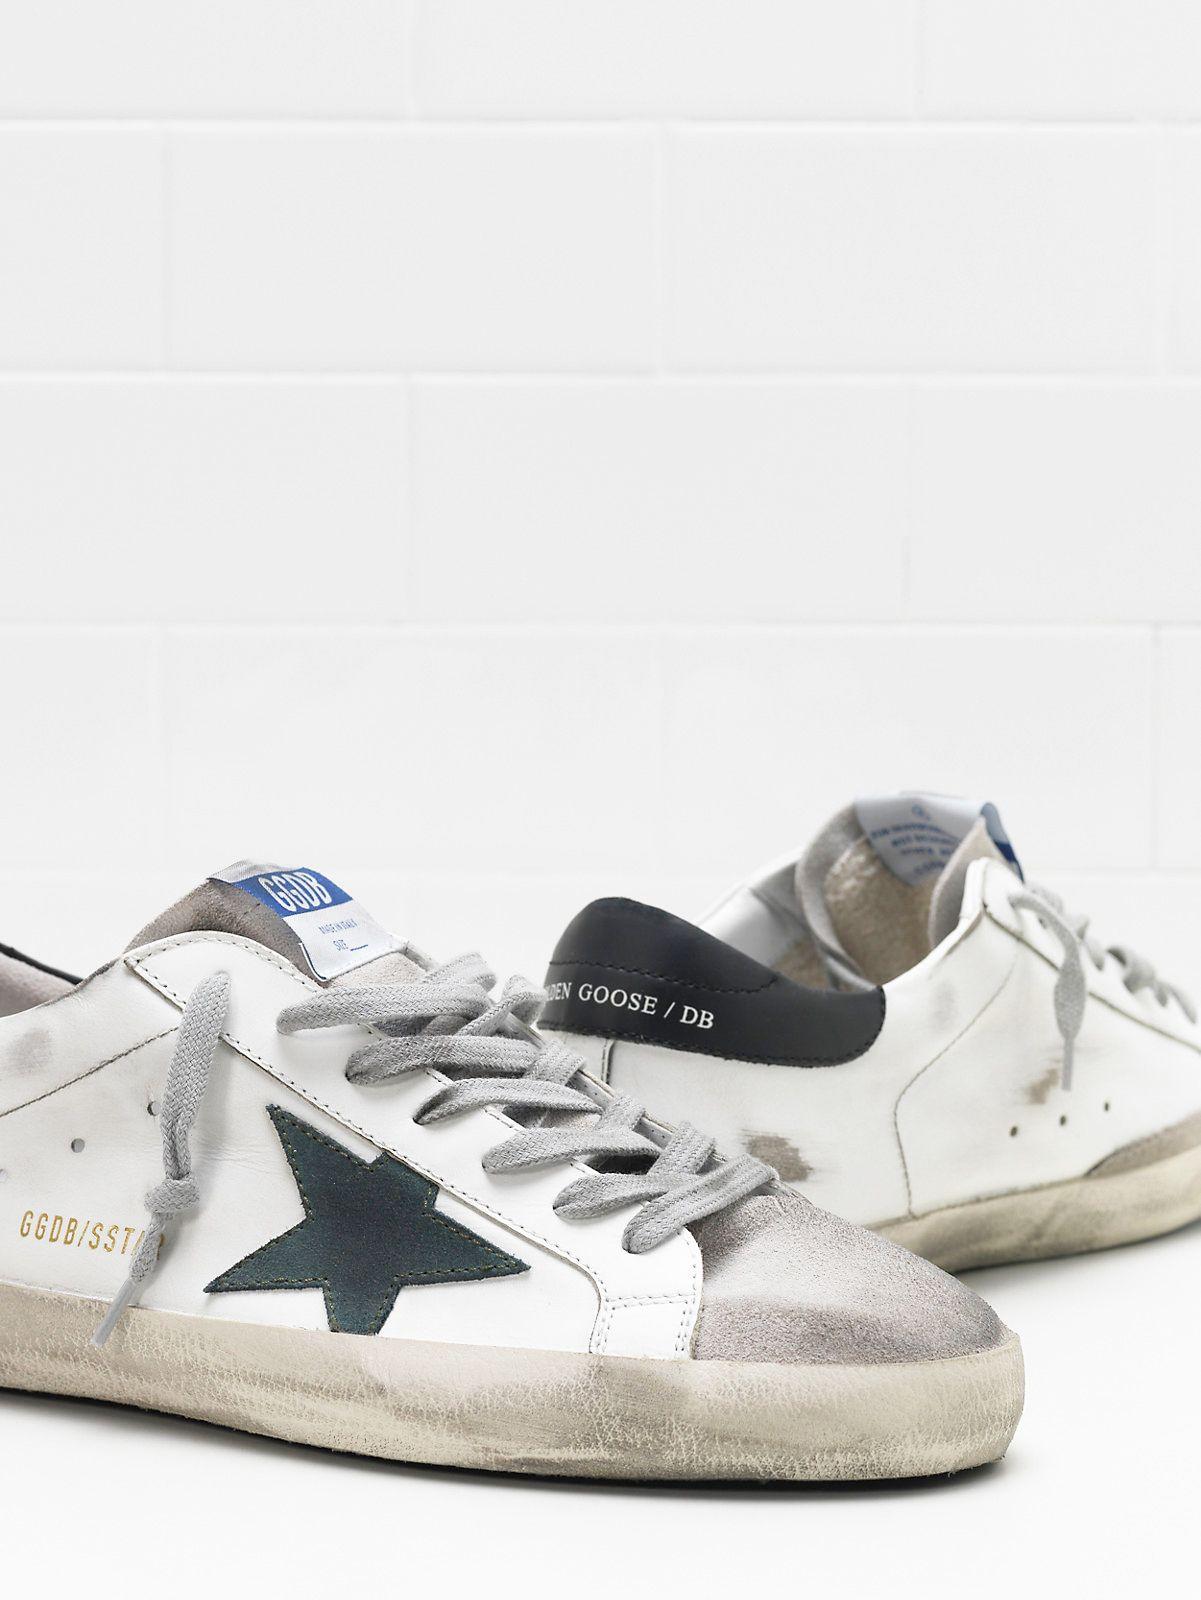 sneakers alte tendenze 2019